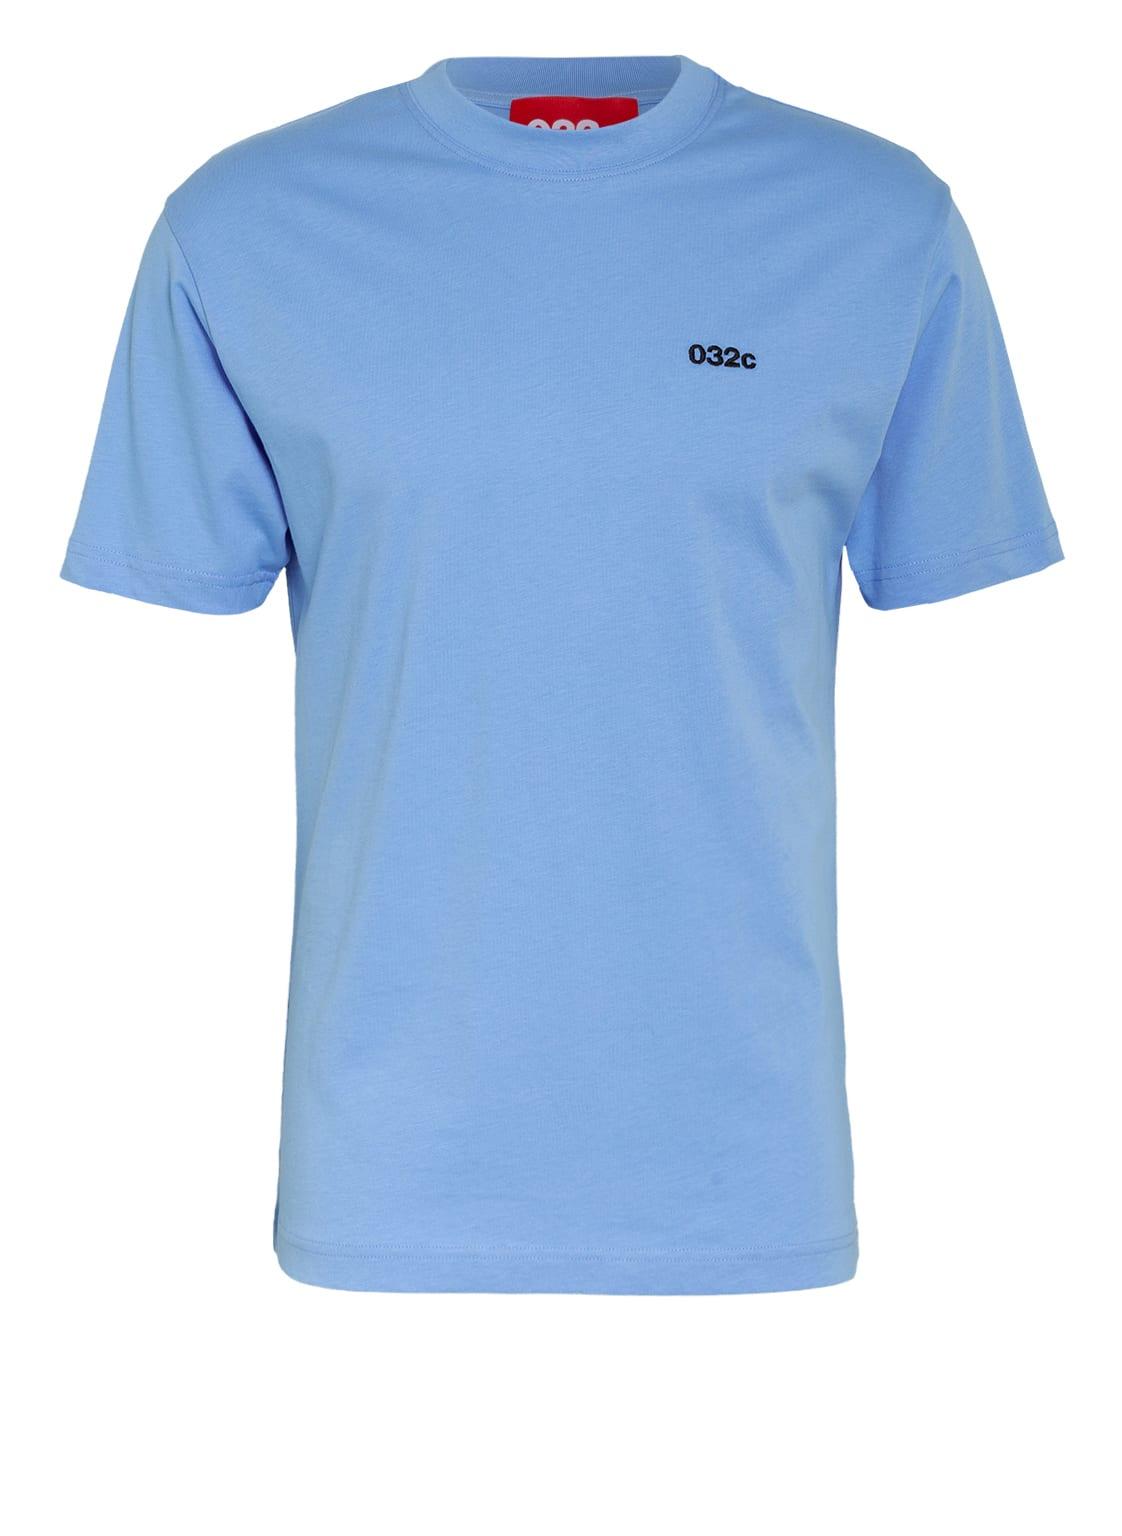 Image of 032c T-Shirt blau